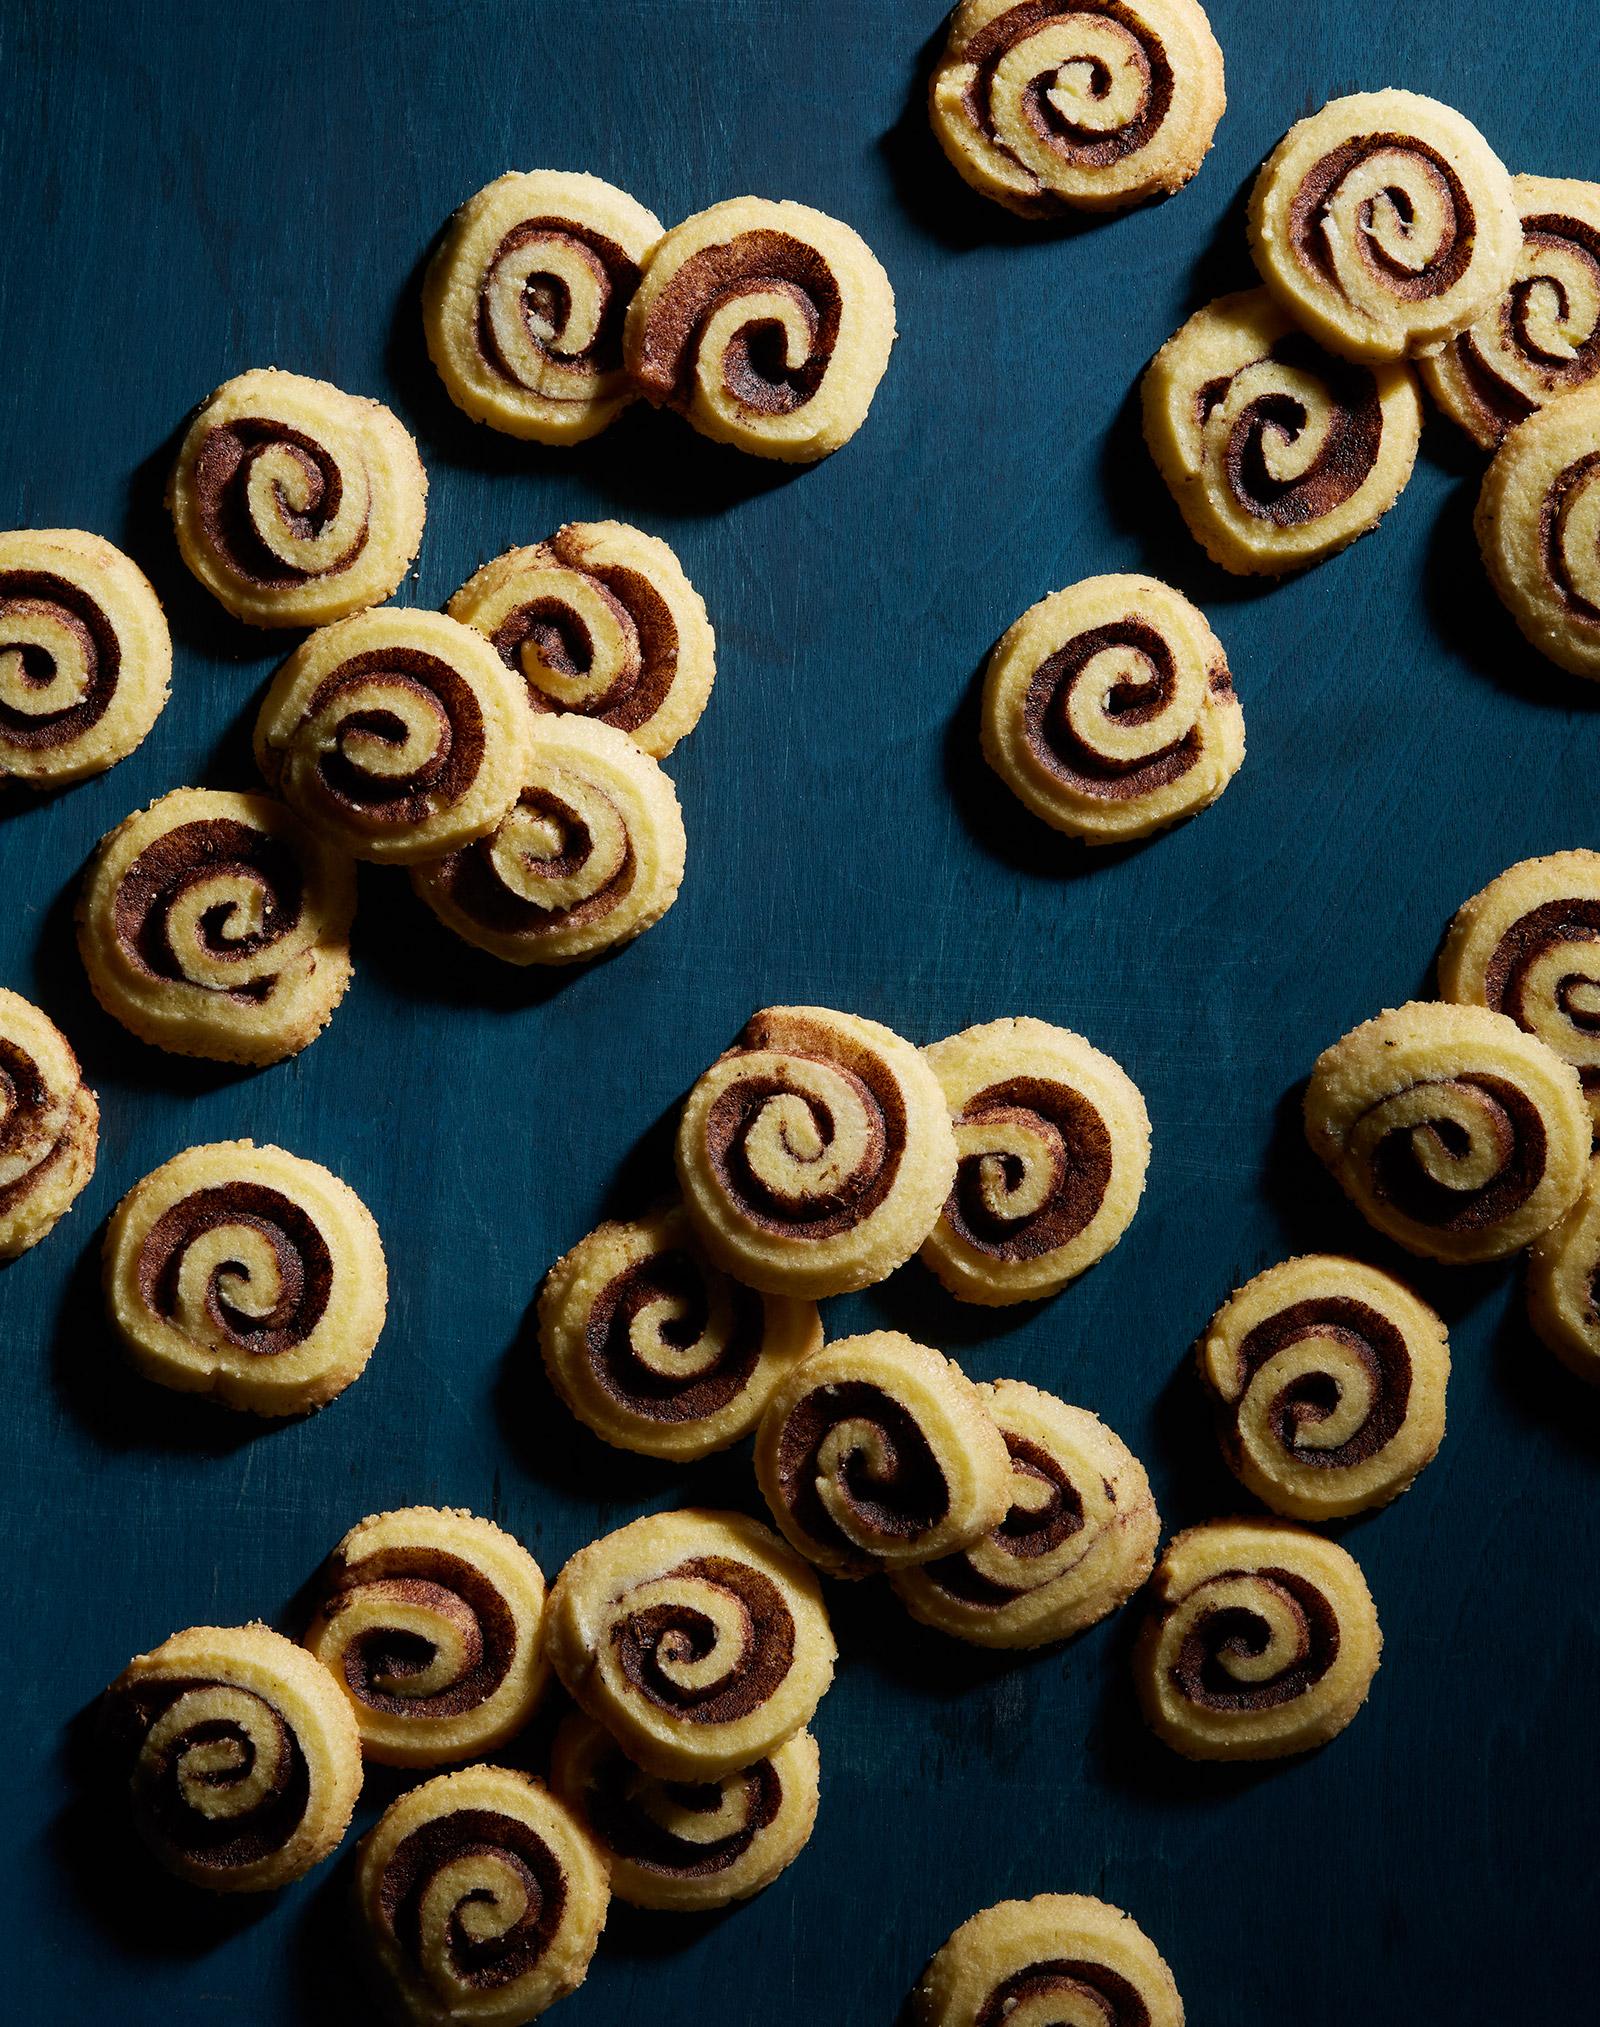 gluten free lemon anise cookies with cocoa swirl